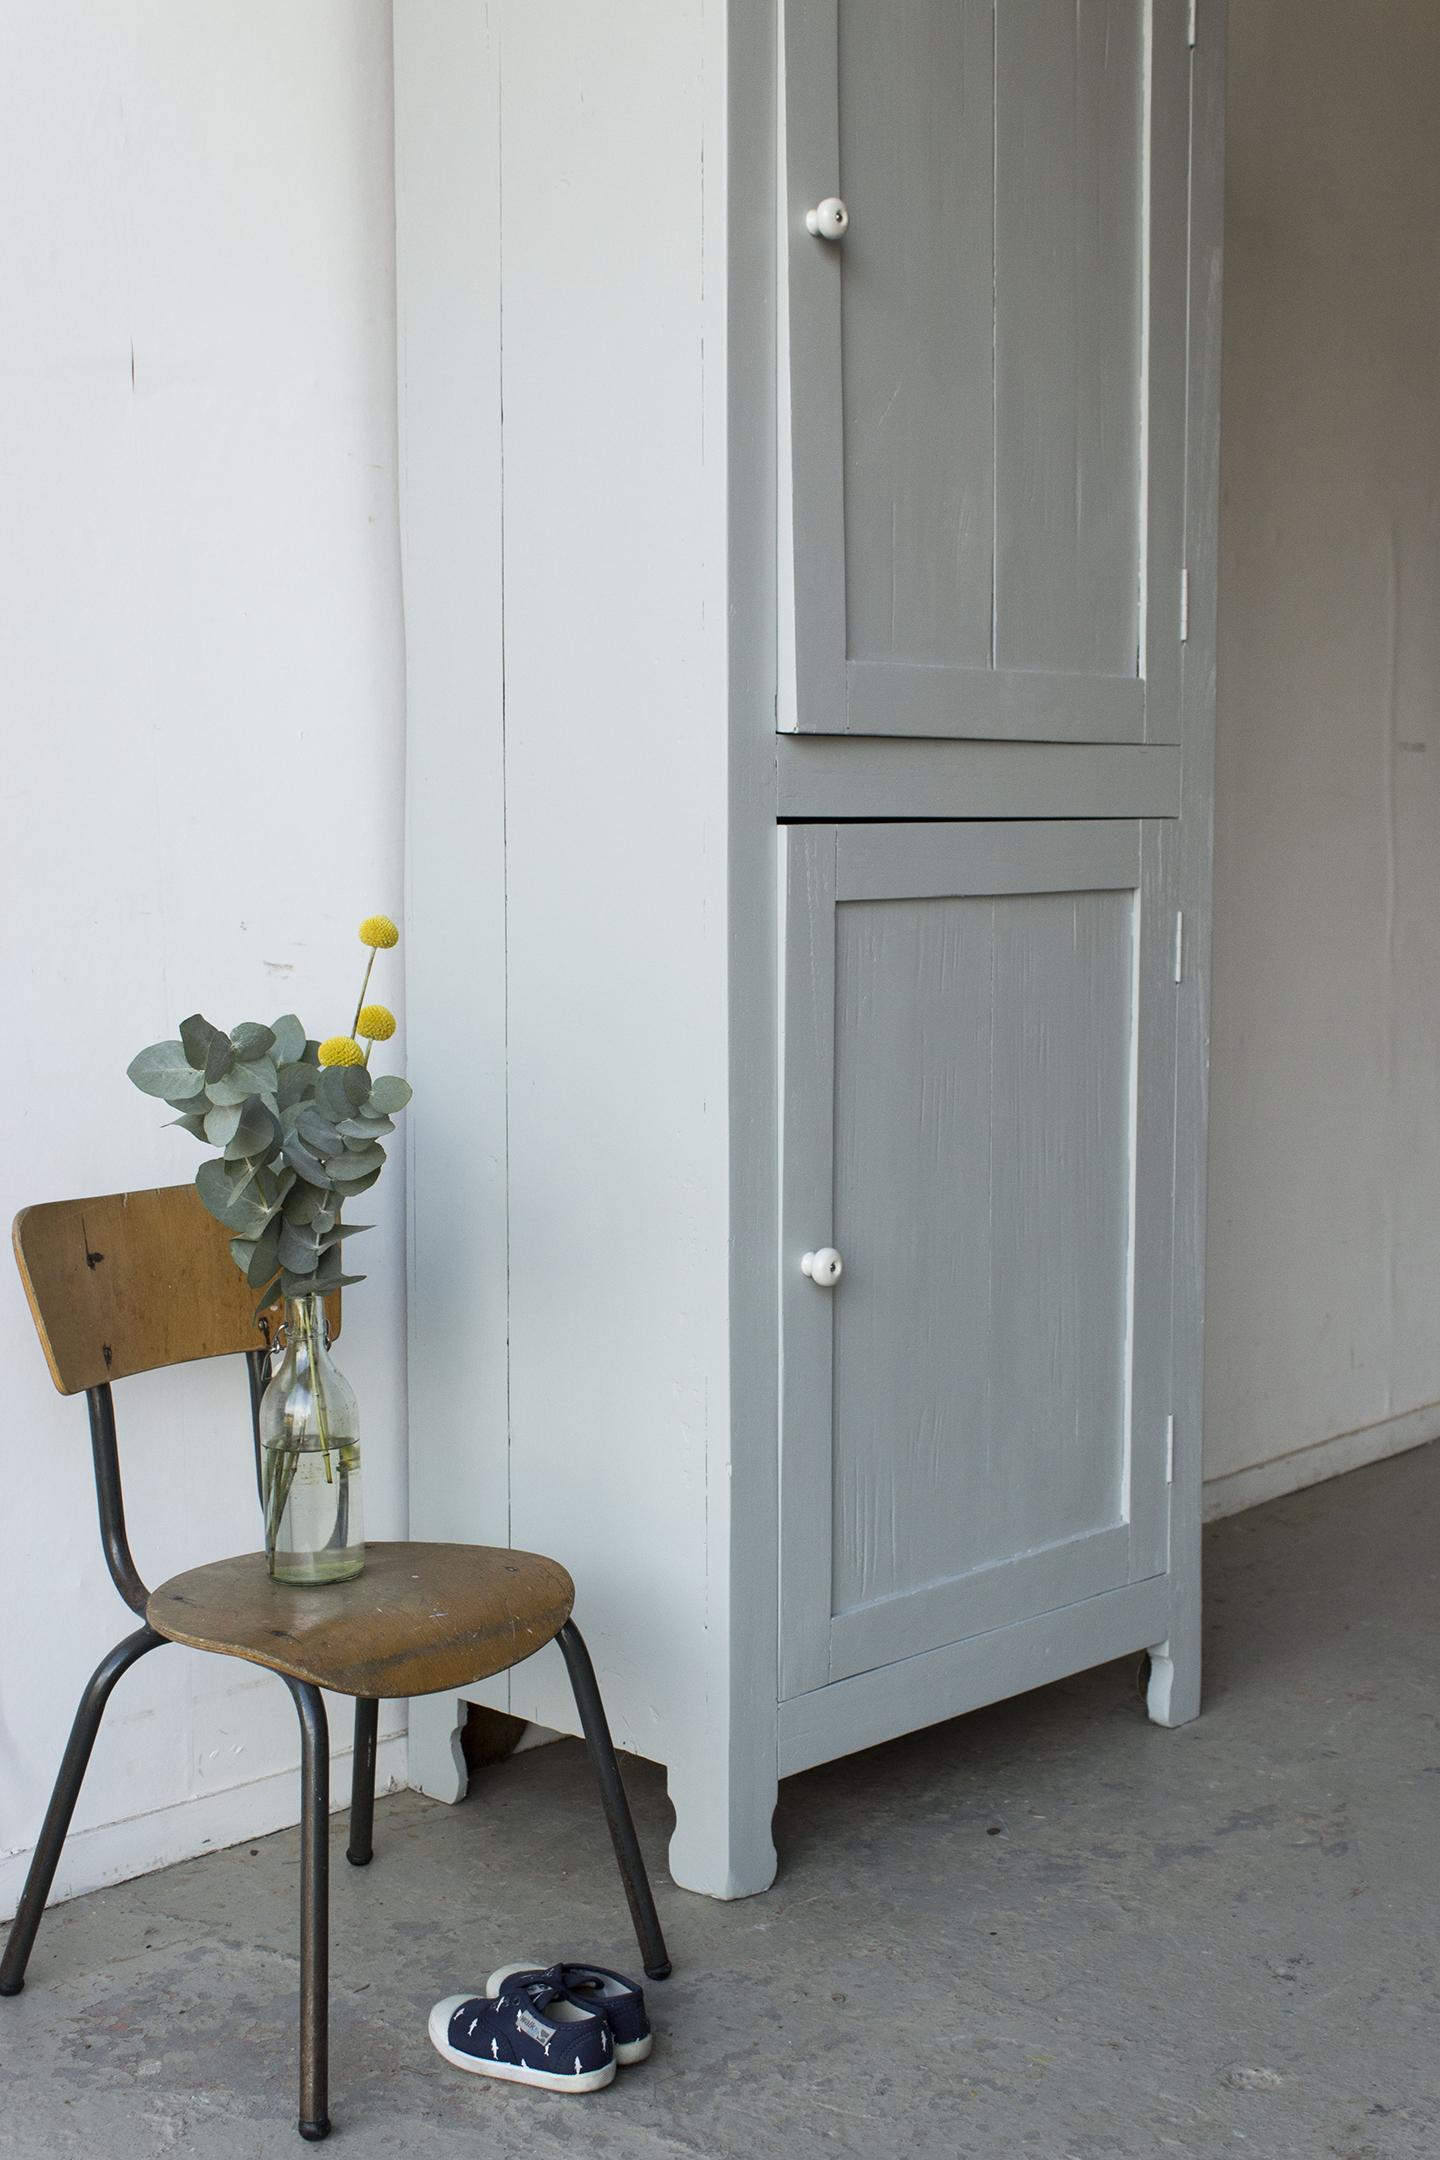 1399 - zachtgrijs vintage kledingkastje - Firma Zoethout_2.jpg